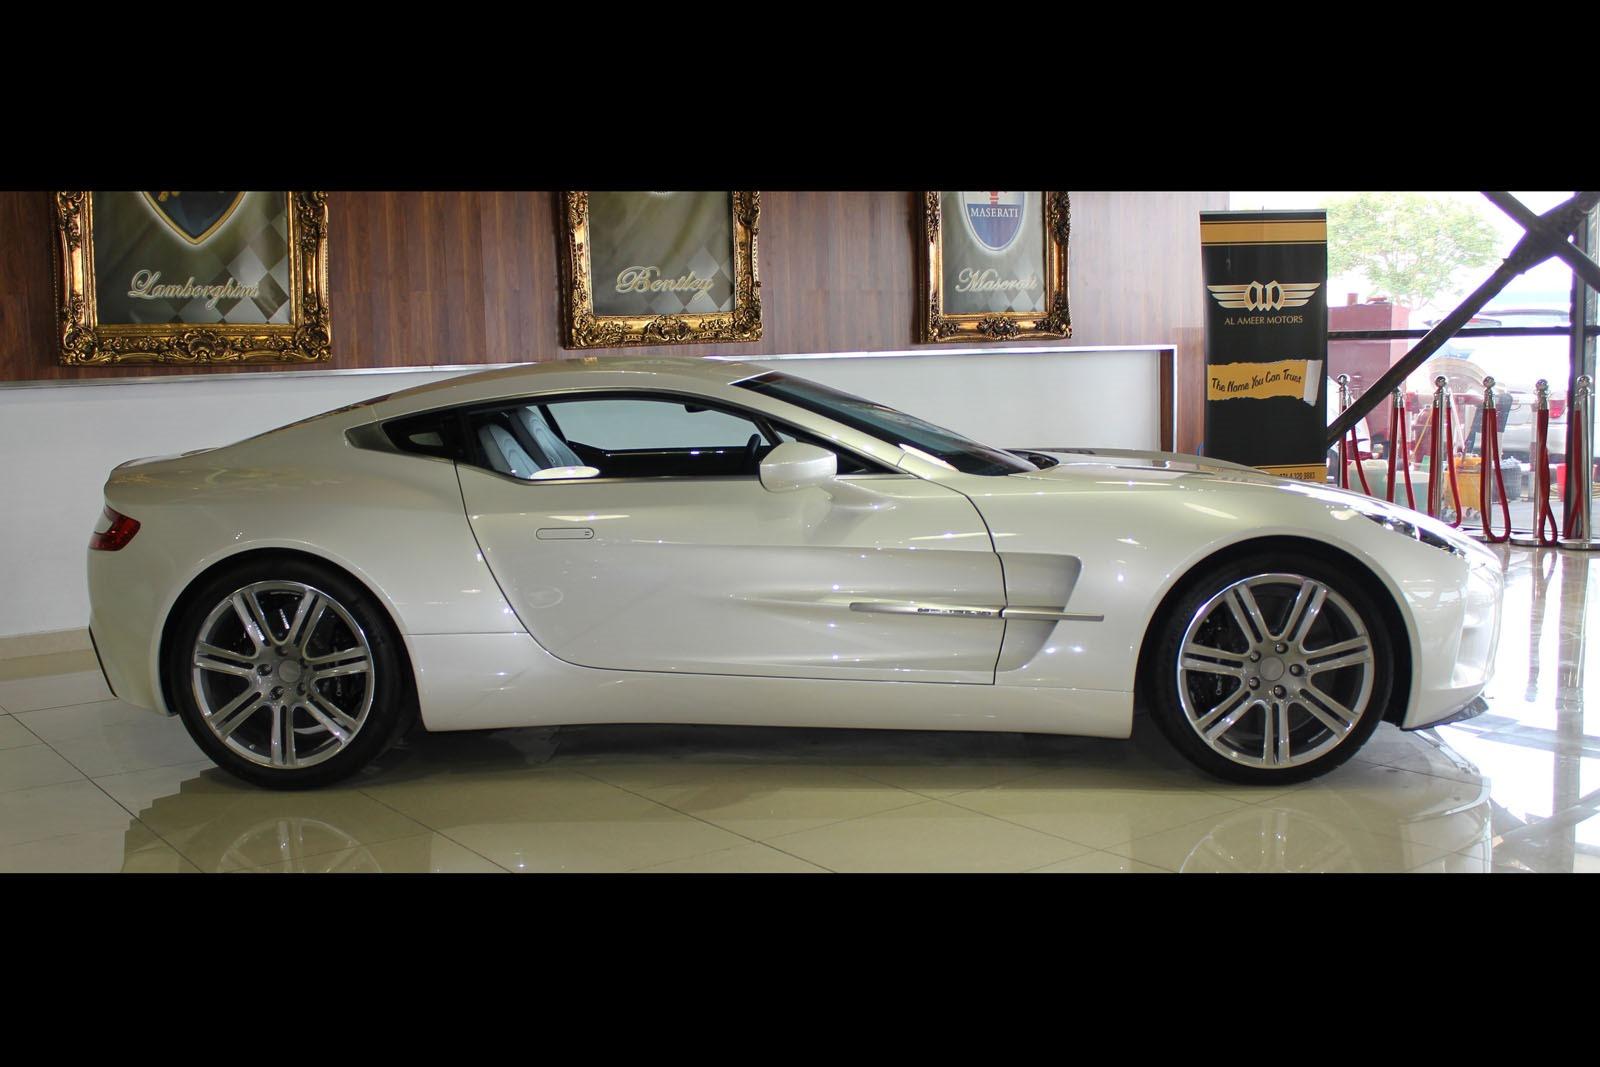 Aston-Martin-One-77-9%25255B3%25255D.jpg